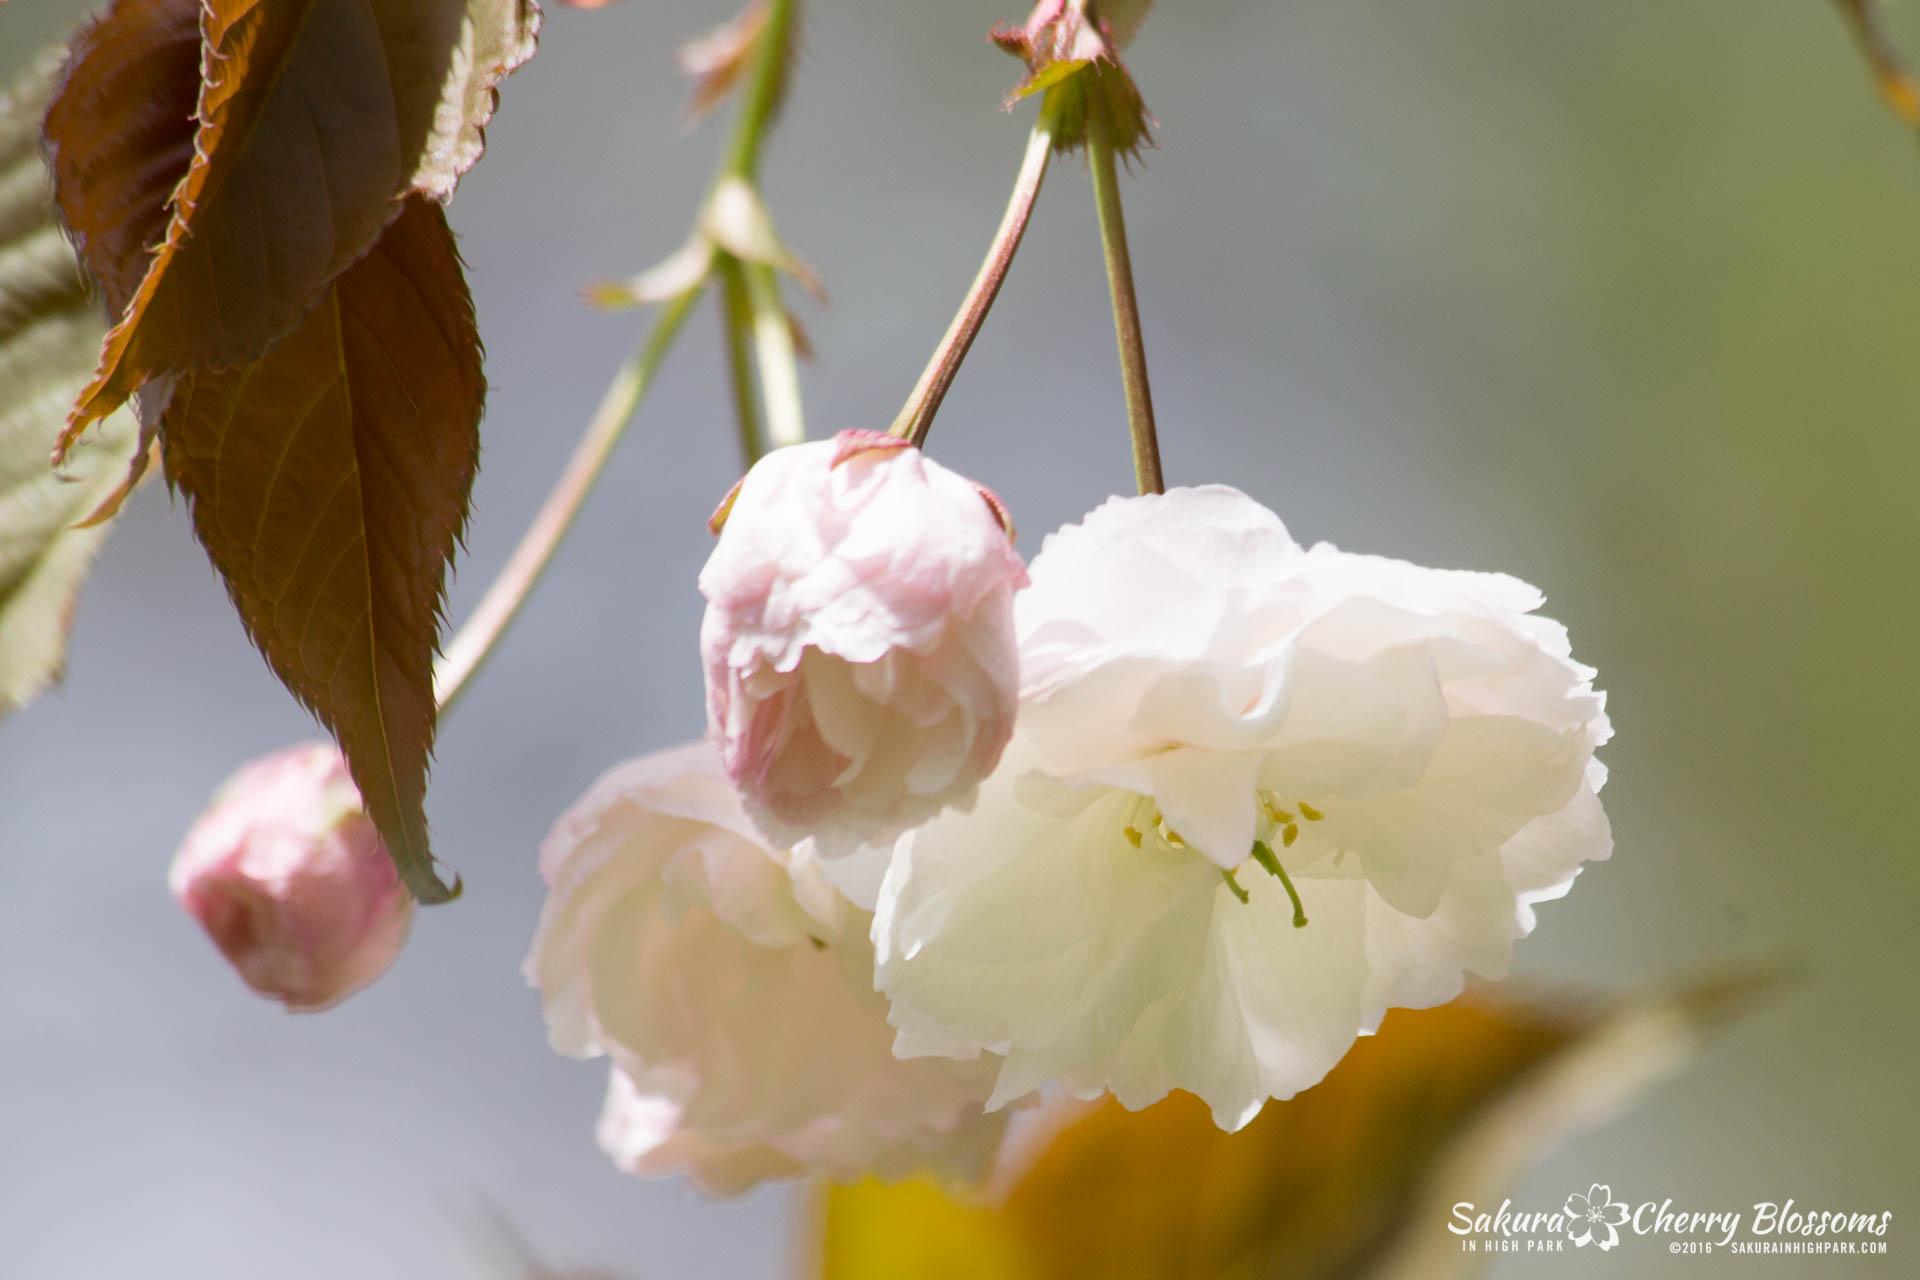 SakurainHighPark-May13-2016-14.jpg